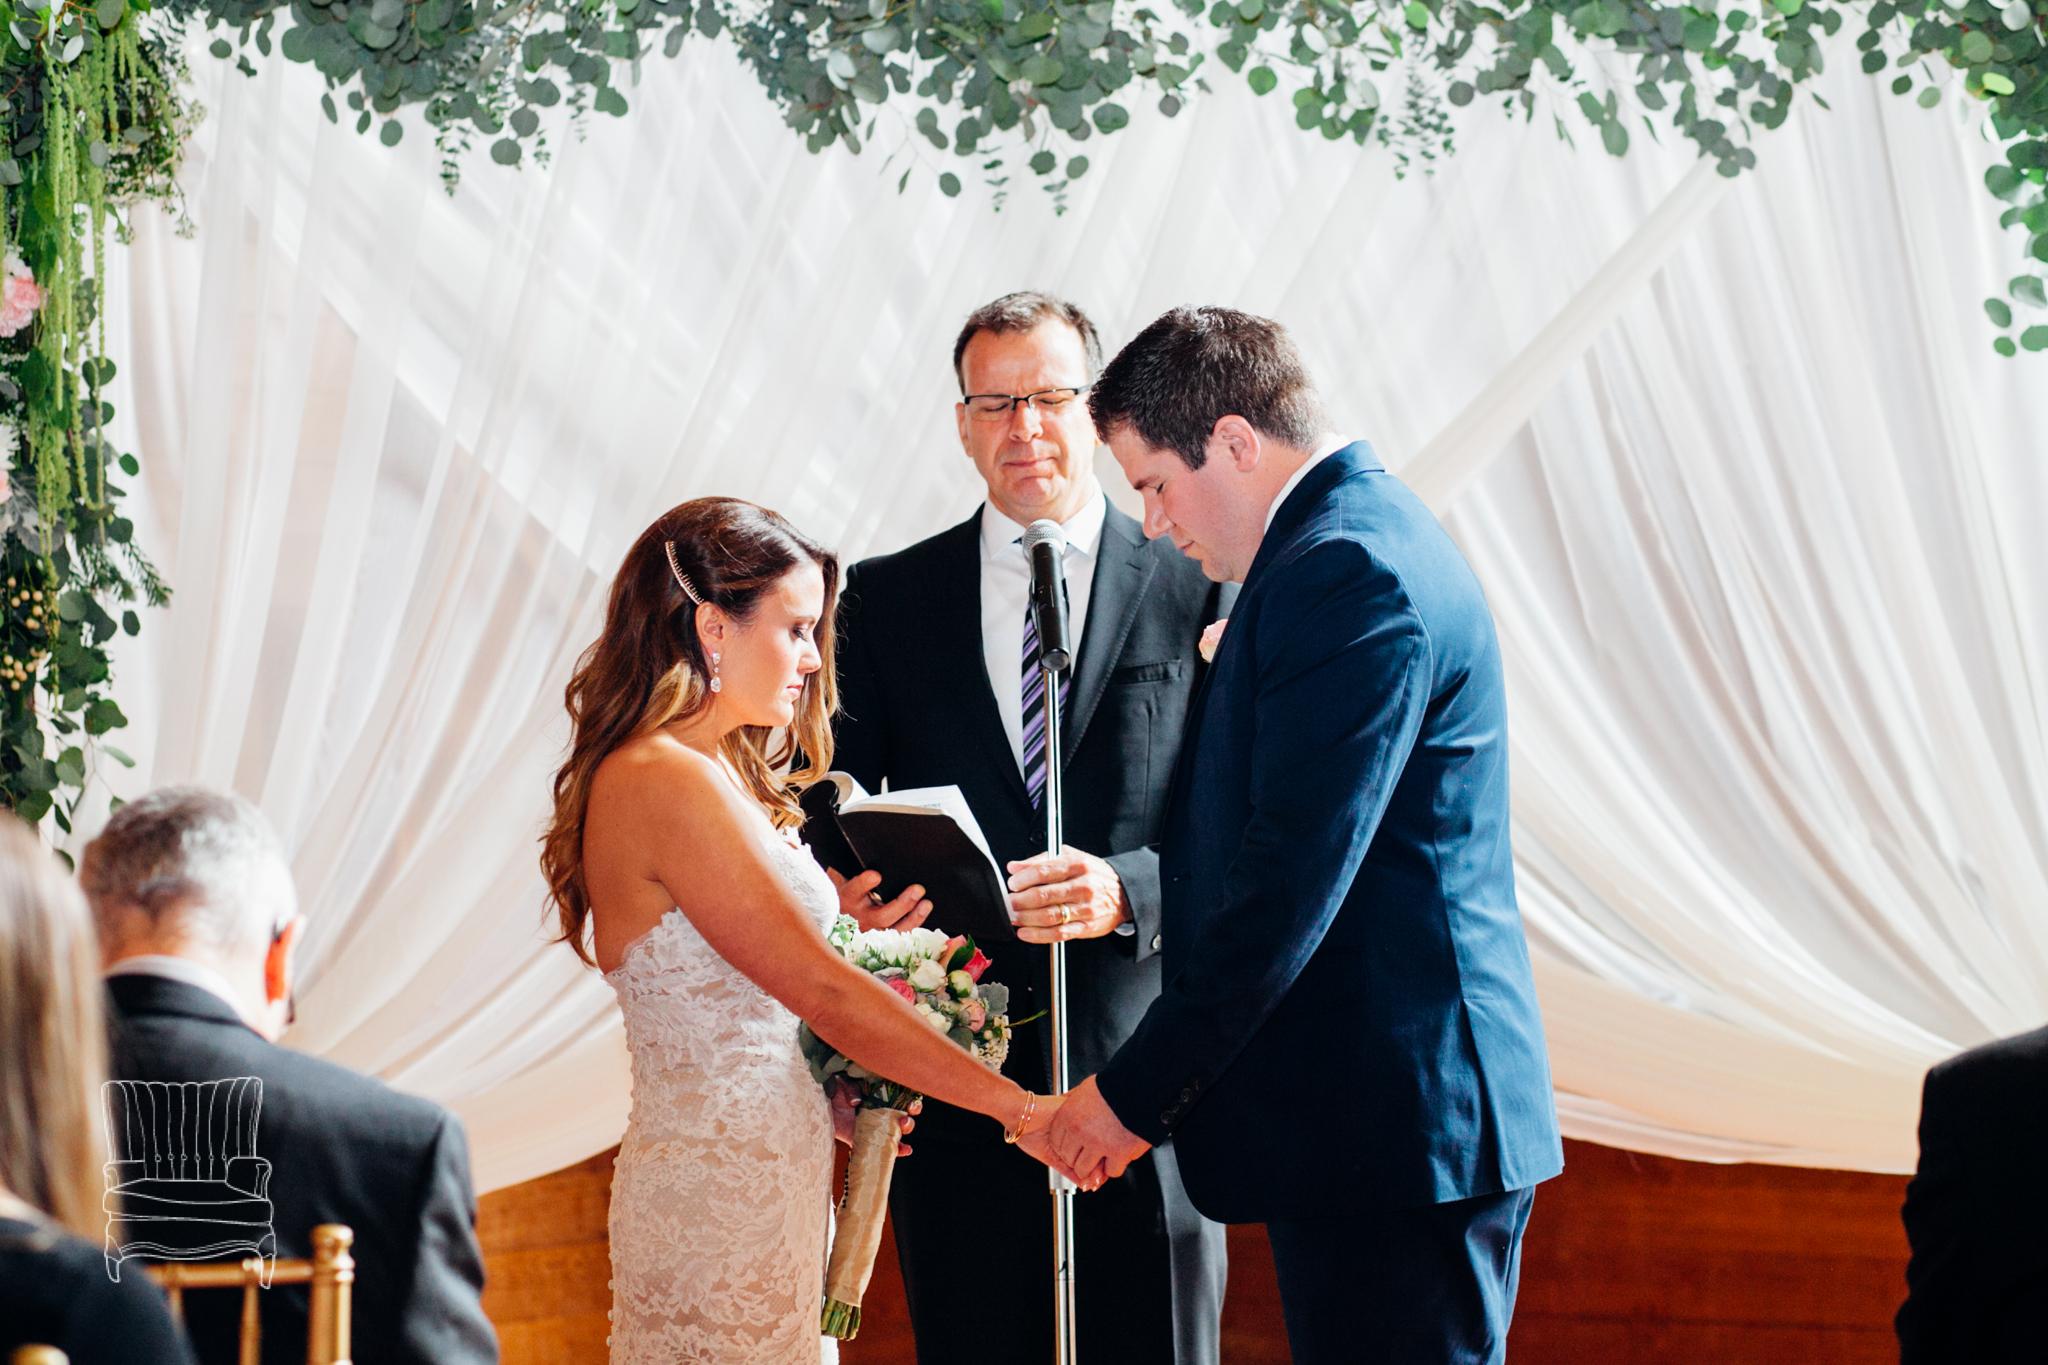 seattle-wedding-photographer-katheryn-moran-russells-bothell-wilkins-wedding-photo-51.jpg